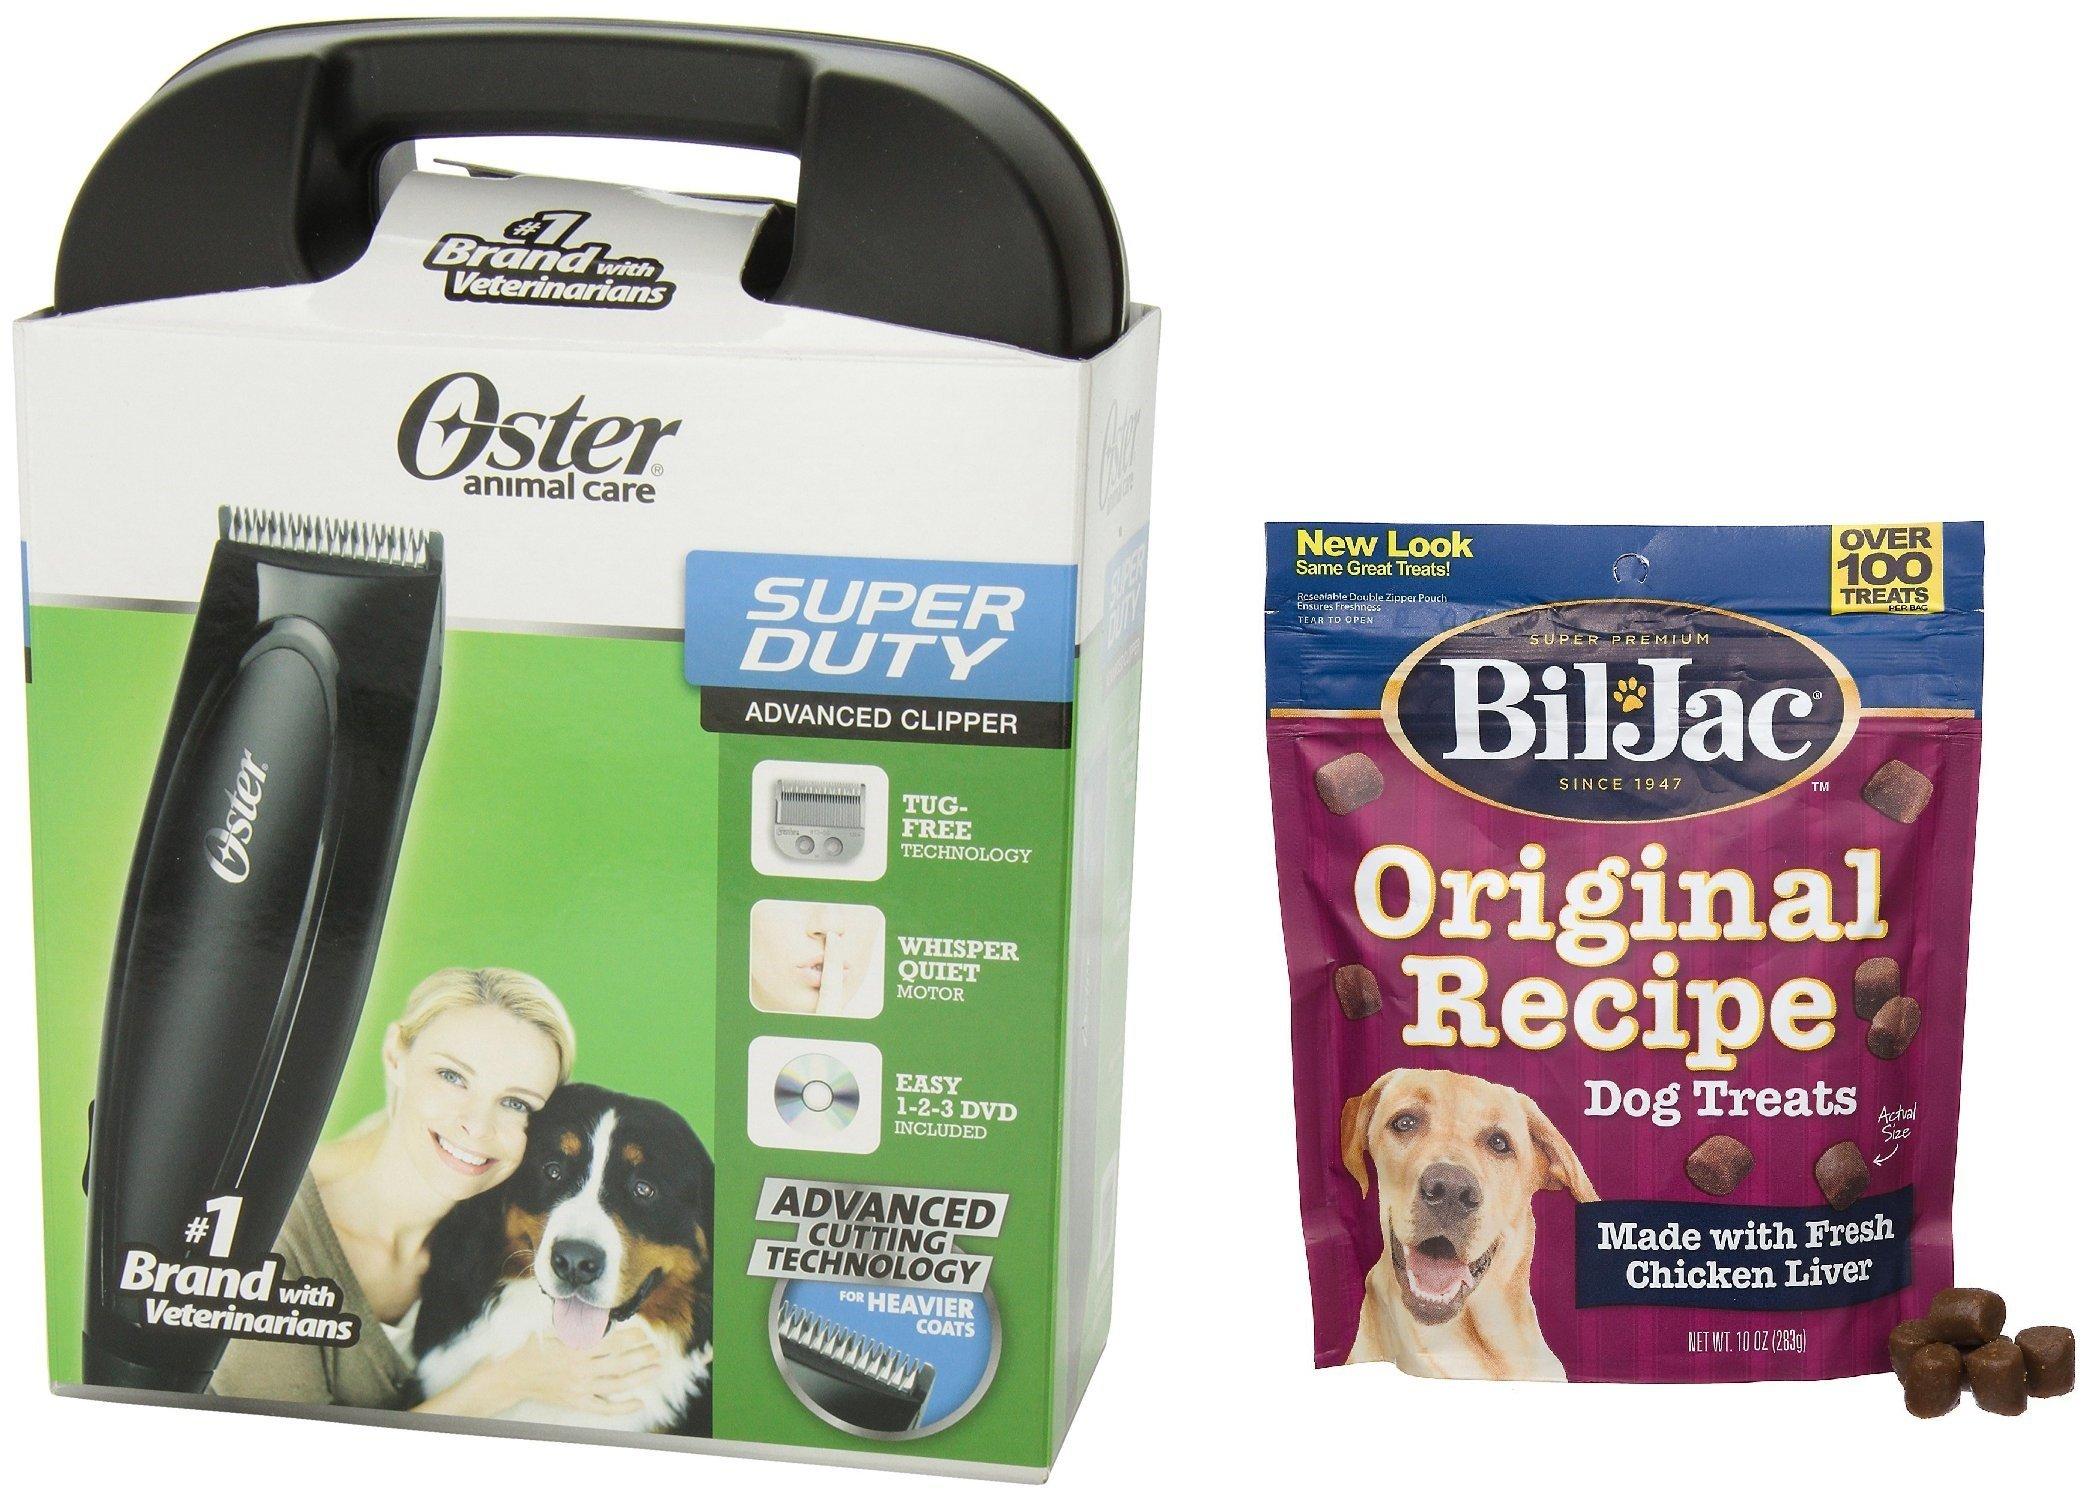 Oster Super Duty Clipper Kit - Includes Bil-Jac Original Recipe Dog Treats 10oz by Oster